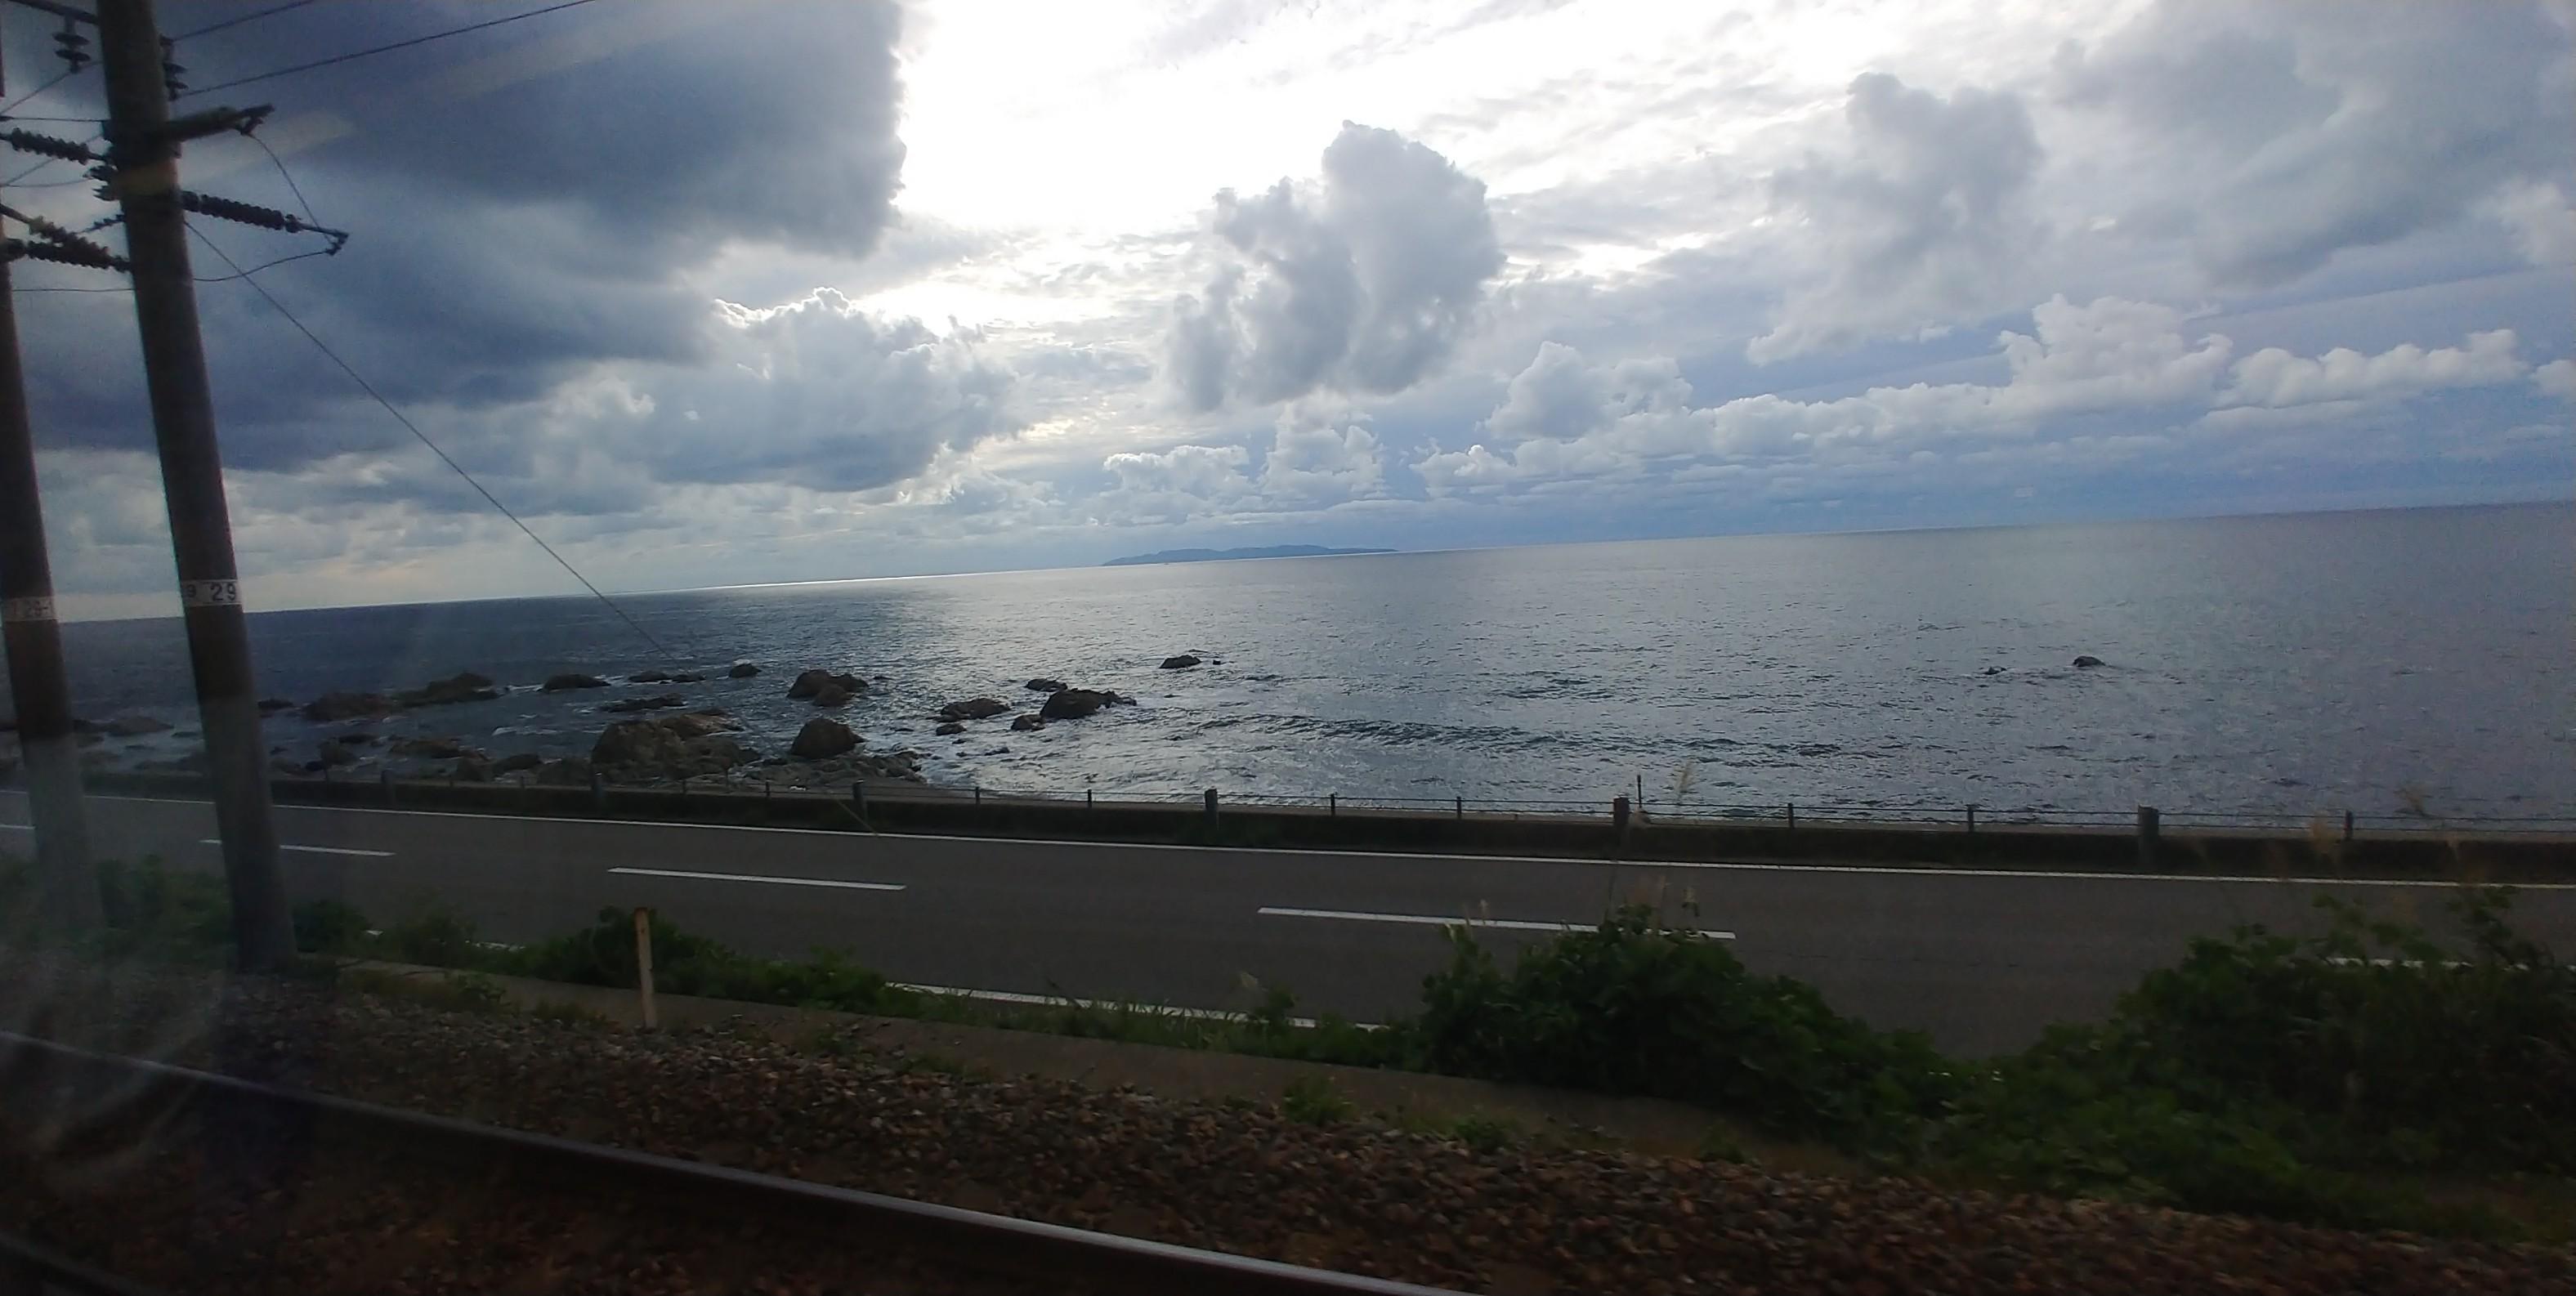 f:id:kishuji-kaisoku:20191229003830j:image